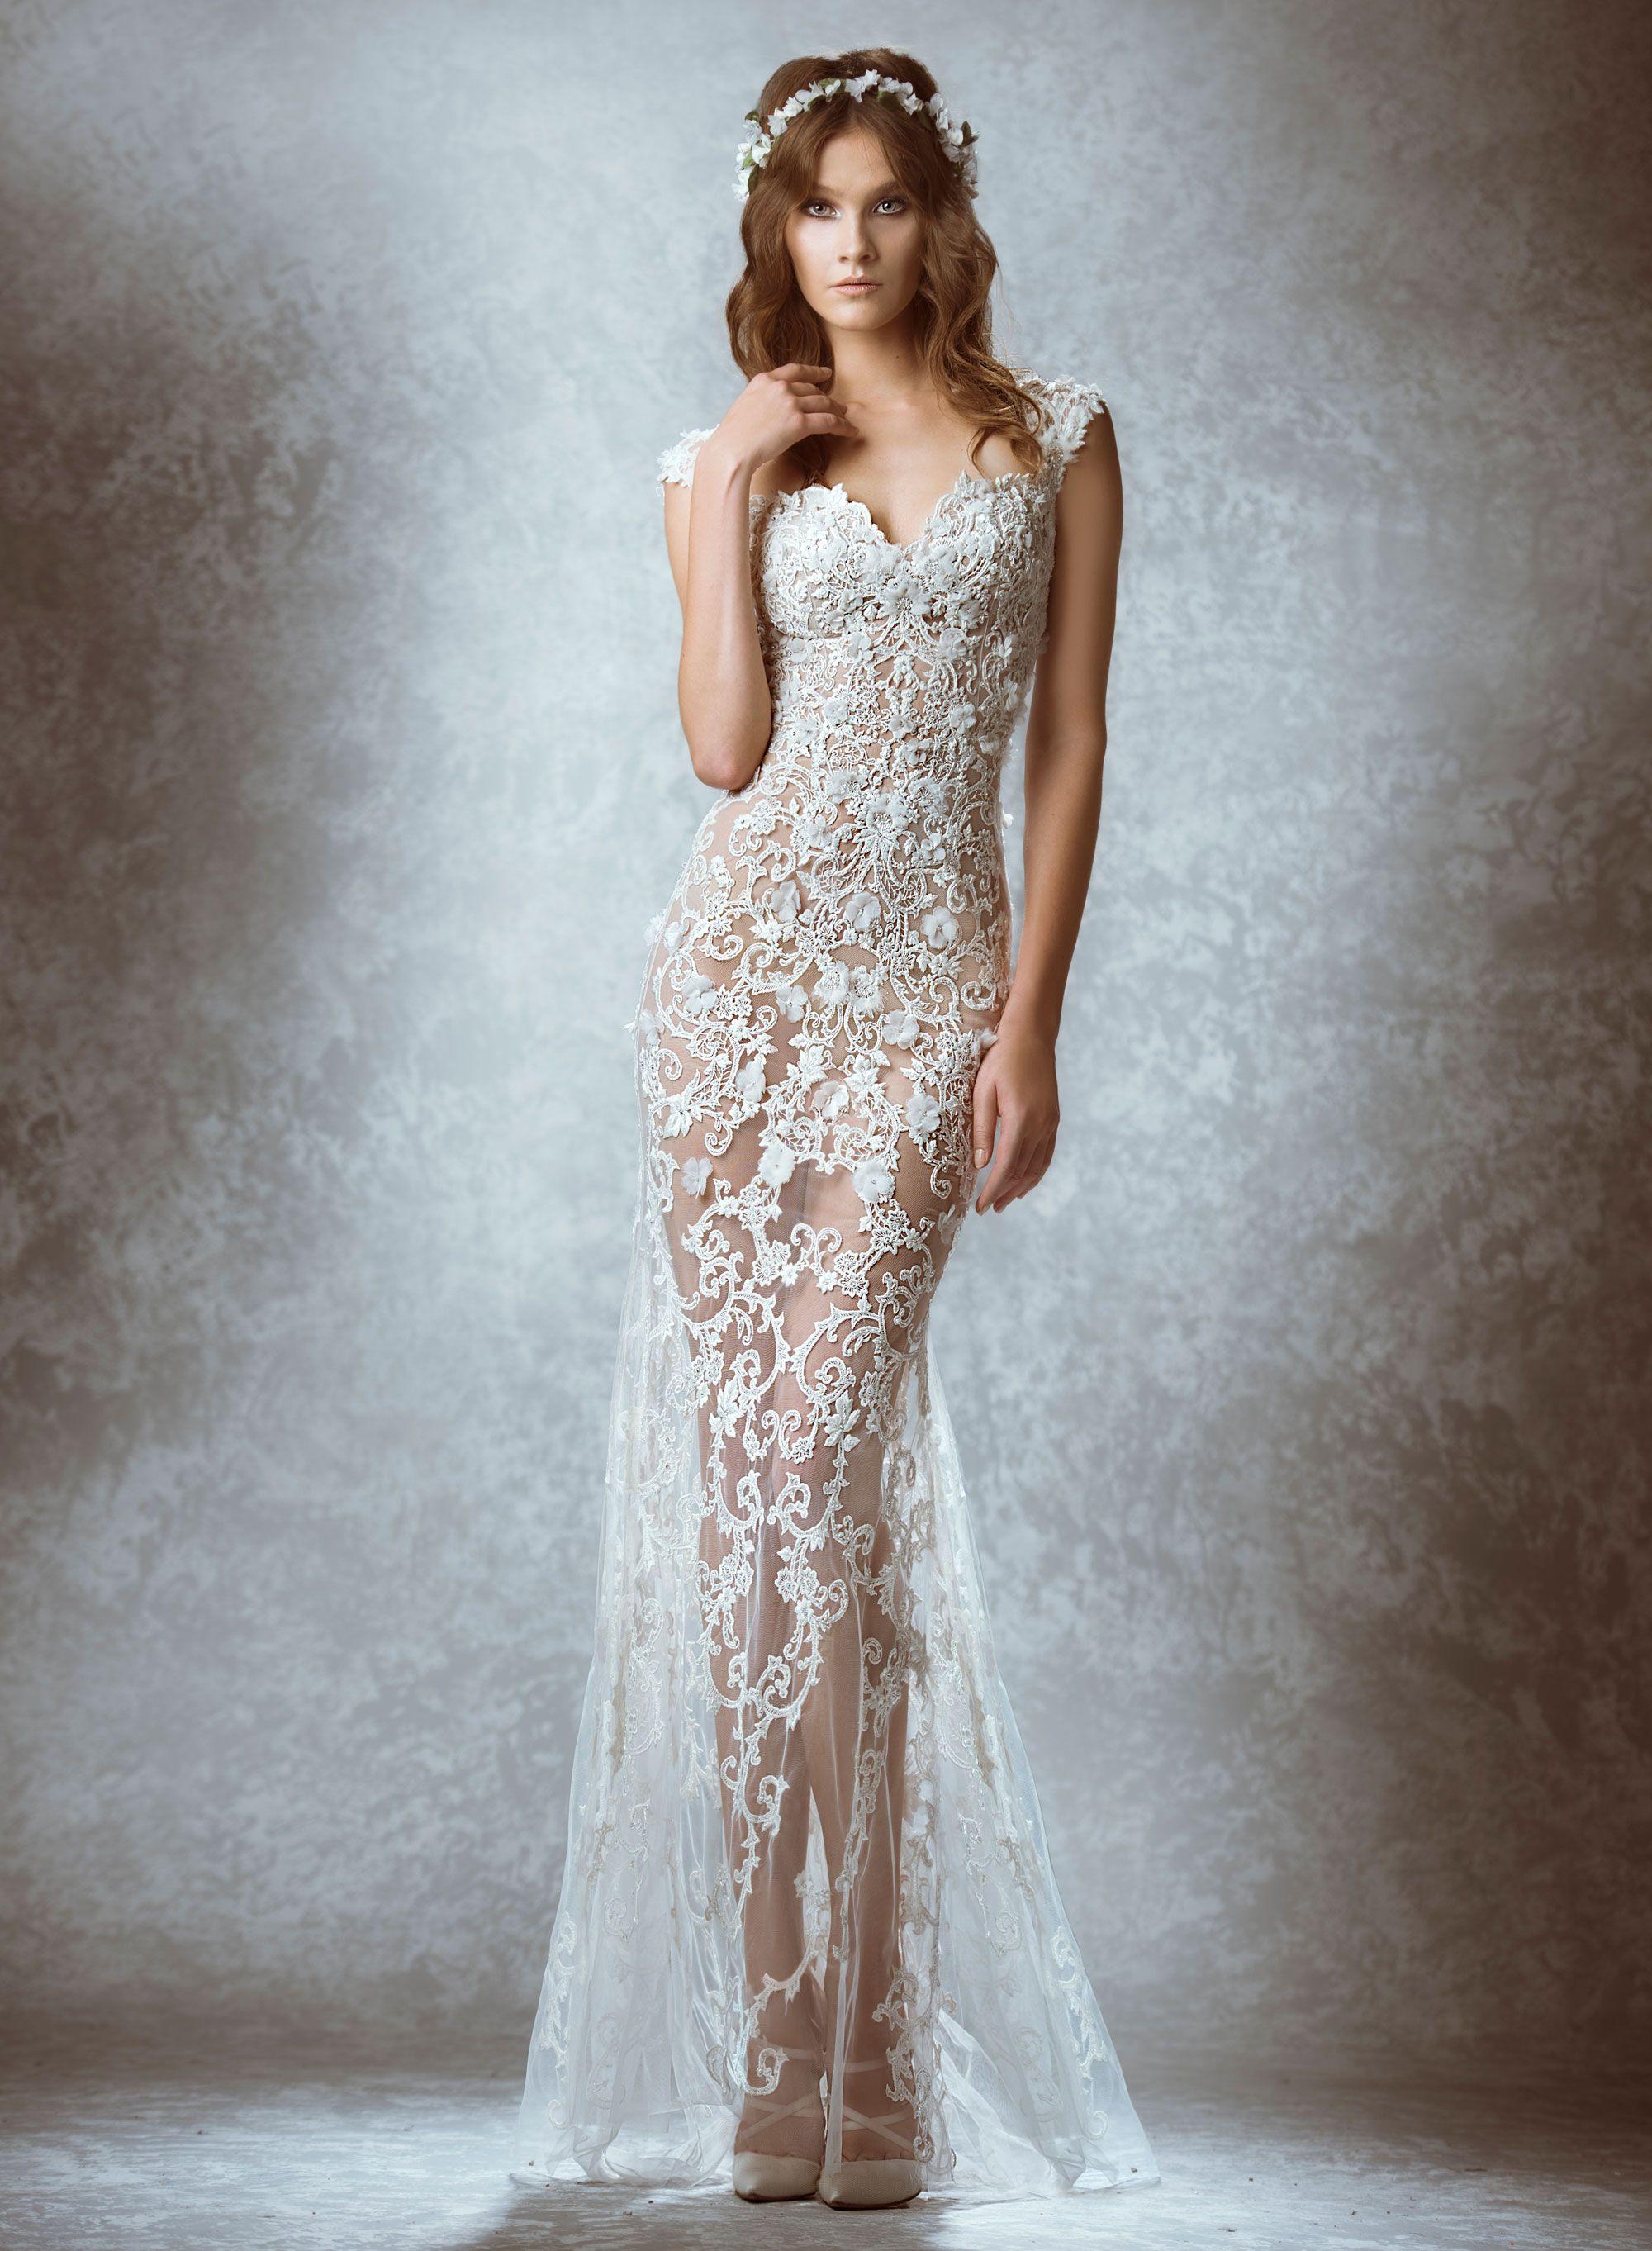 New Wedding Dresses Zuhair Murad 2012   Wedding